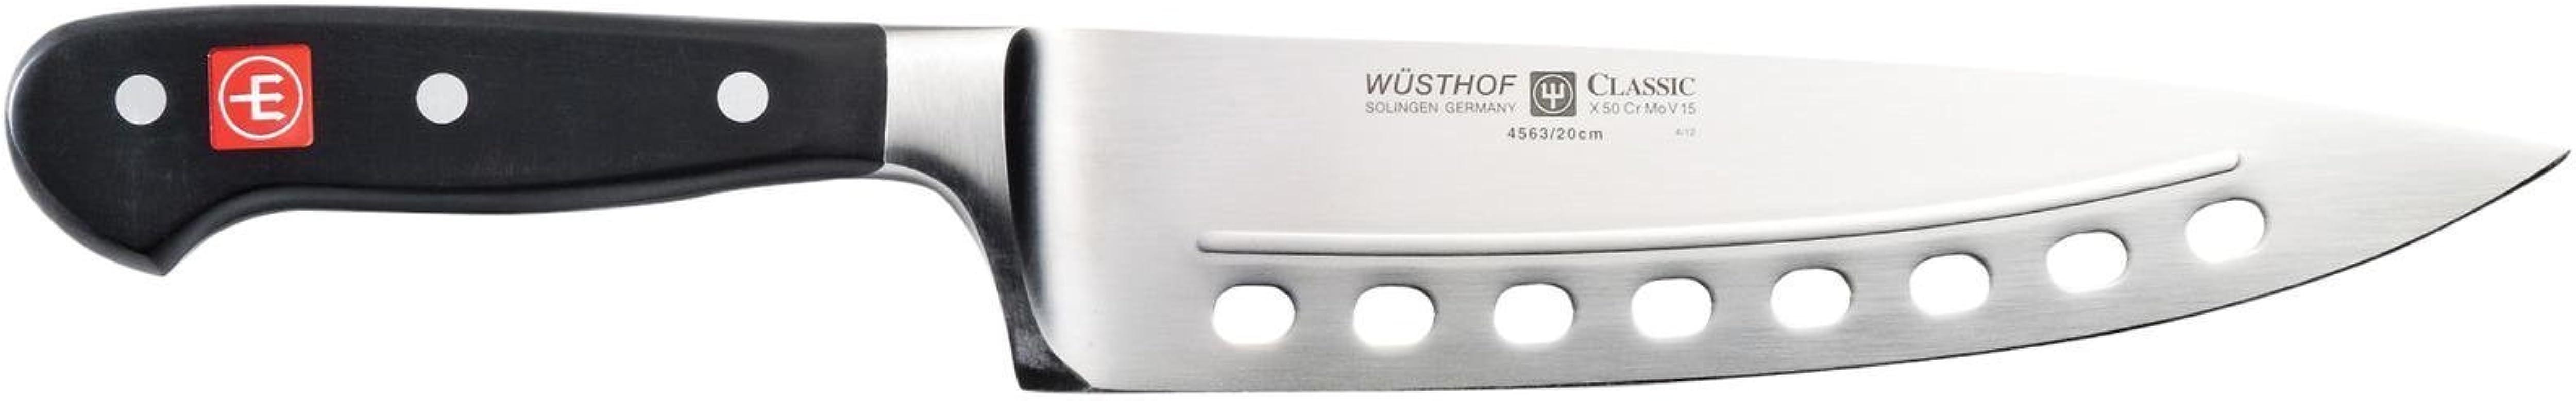 Wusthof Classic Super Glider 8 Inch Chef S Knife